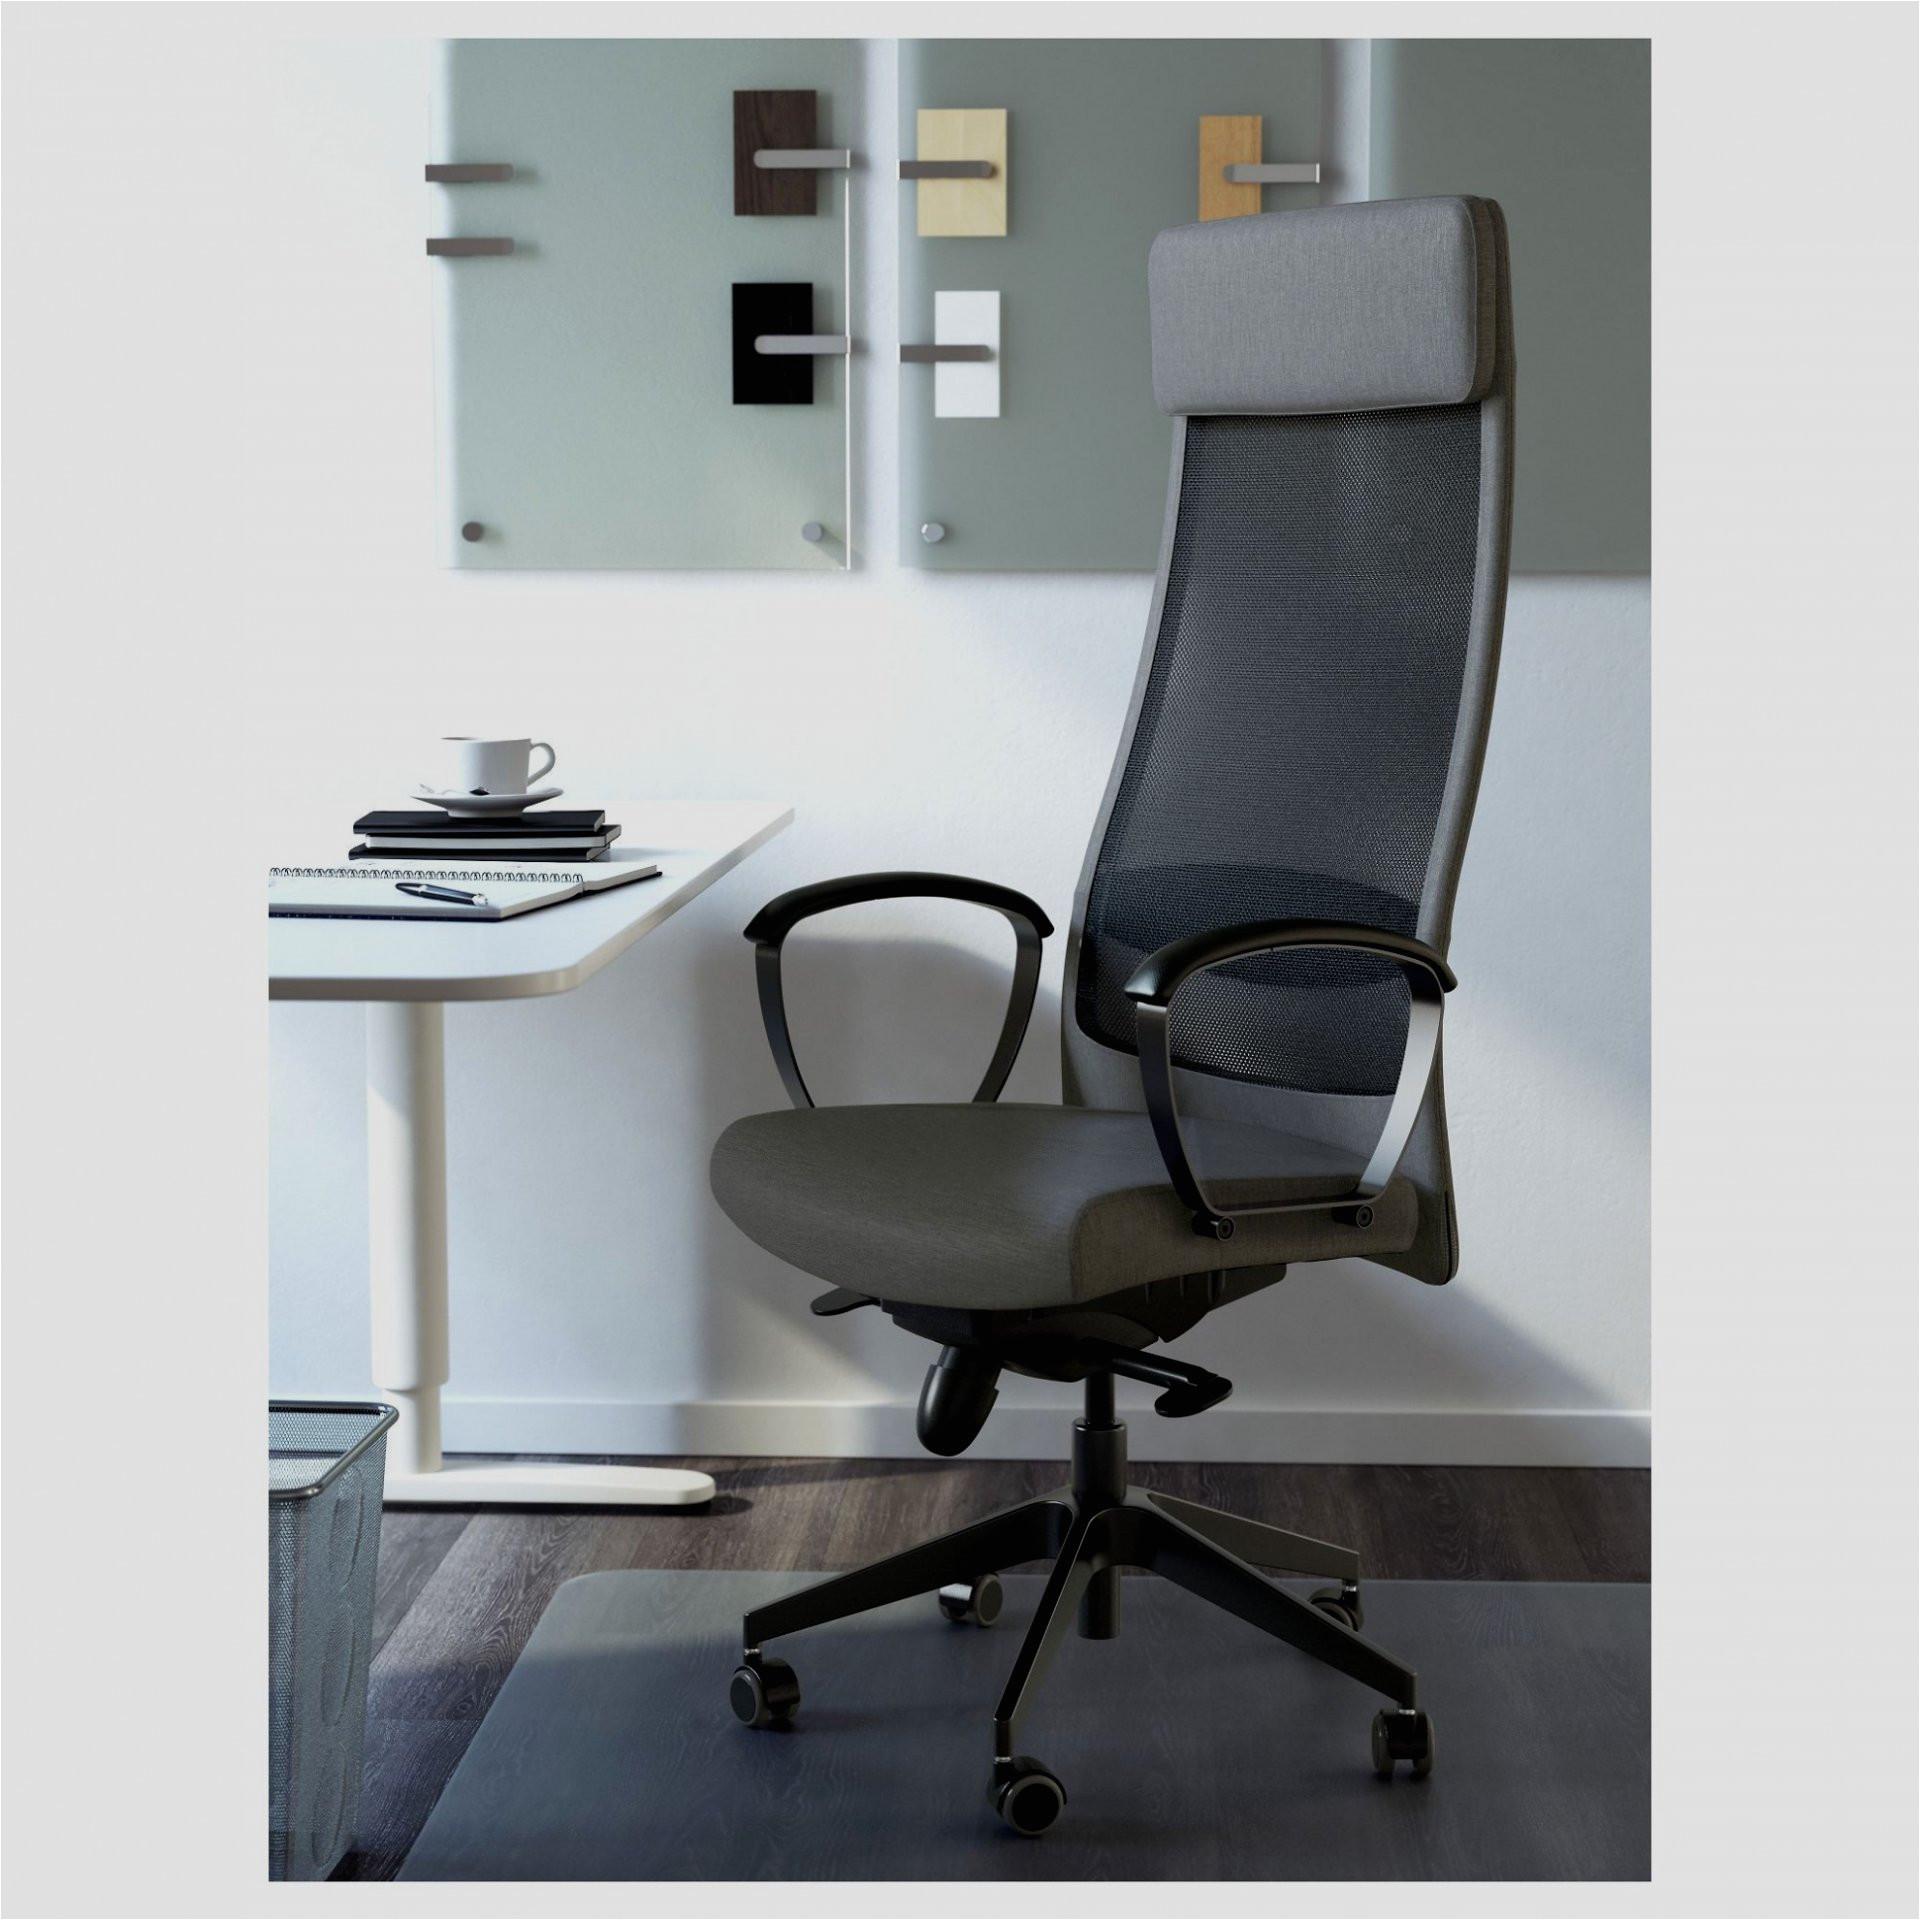 sillas para escritorio juvenil famoso inicio ruedas giratorias para muebles bogotaeslacumbre